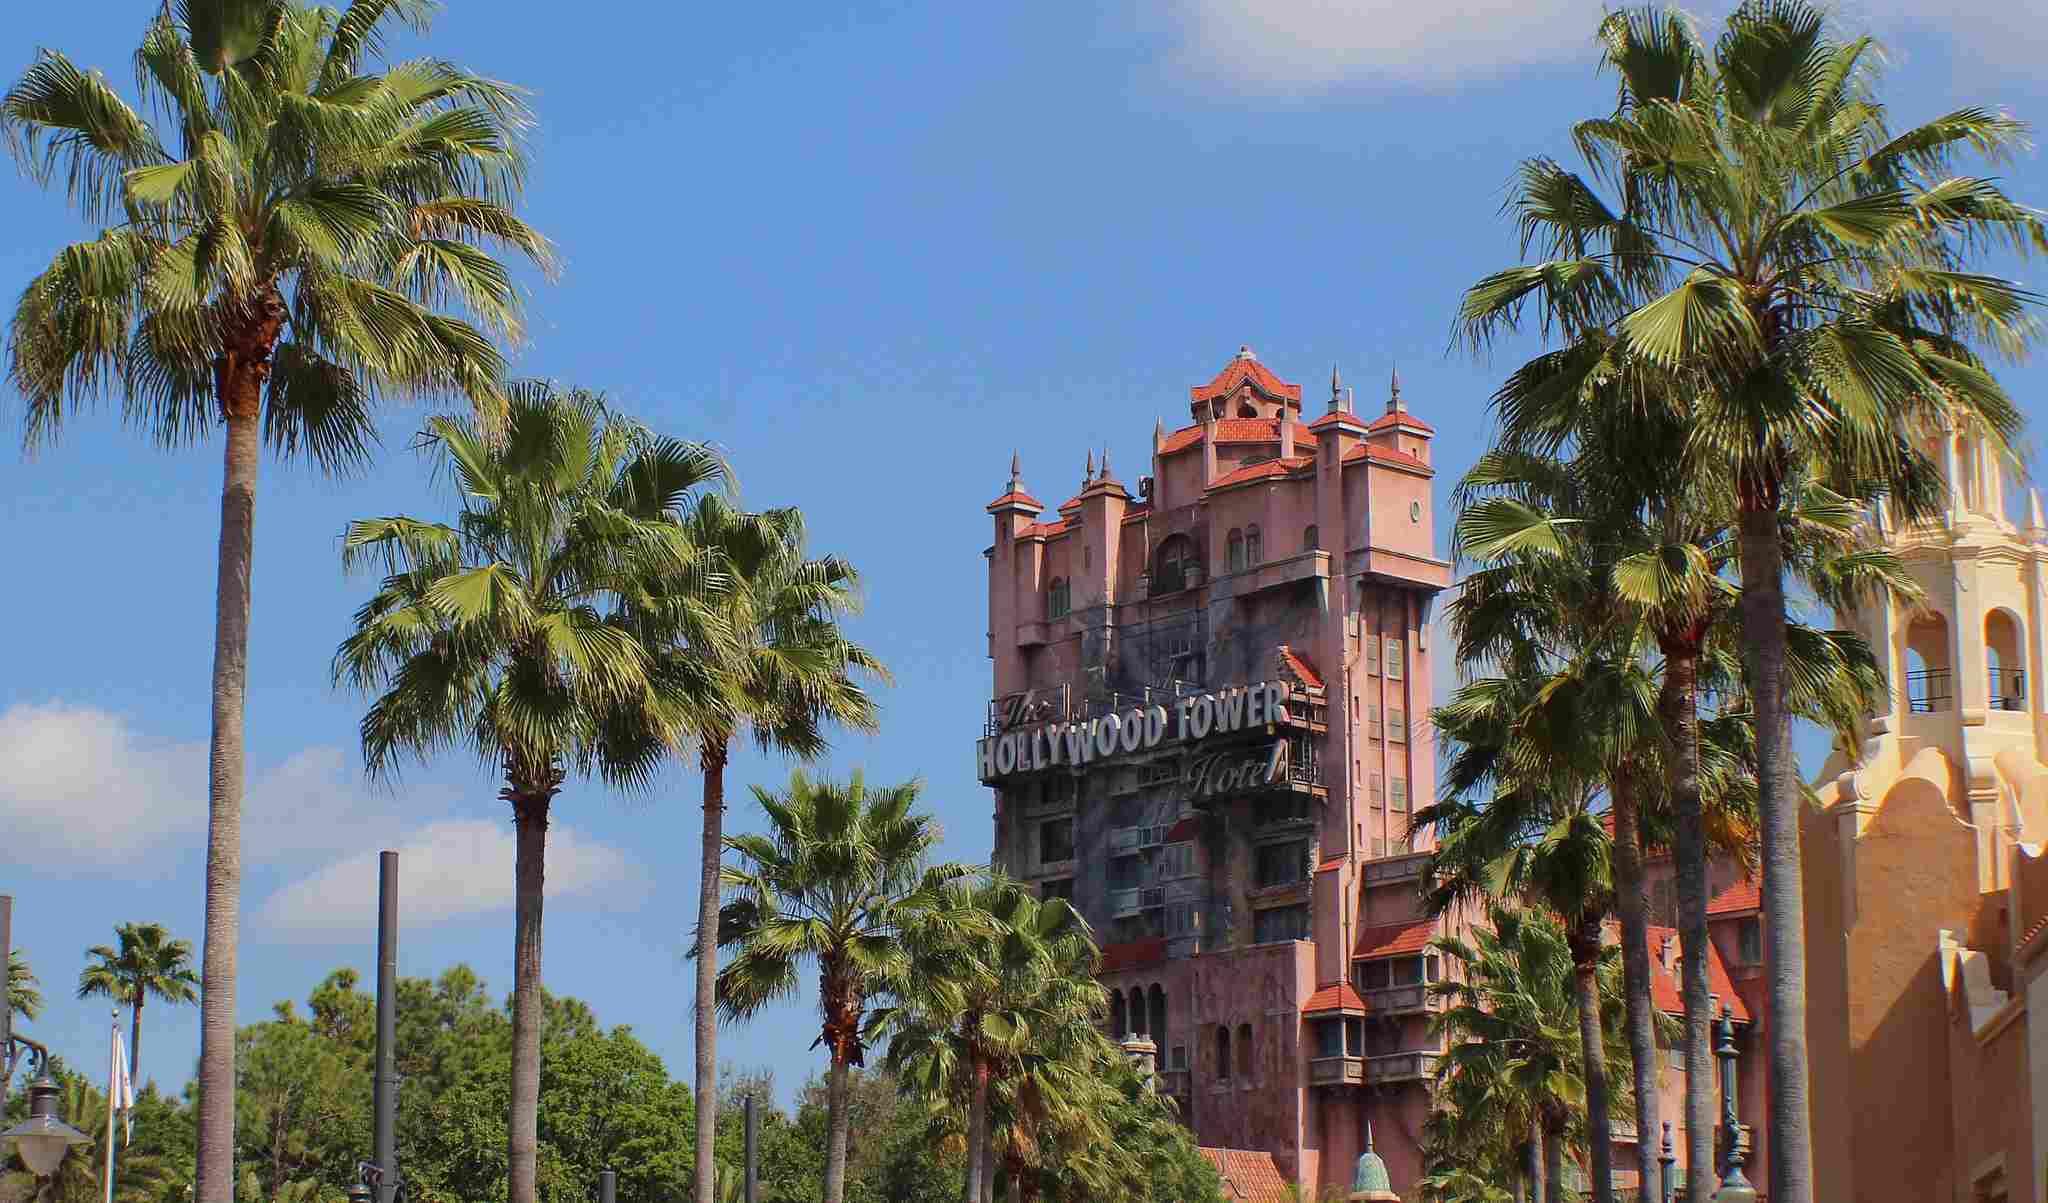 Disney's Twilight Tower of Terror at Disney's Hollywood Studios